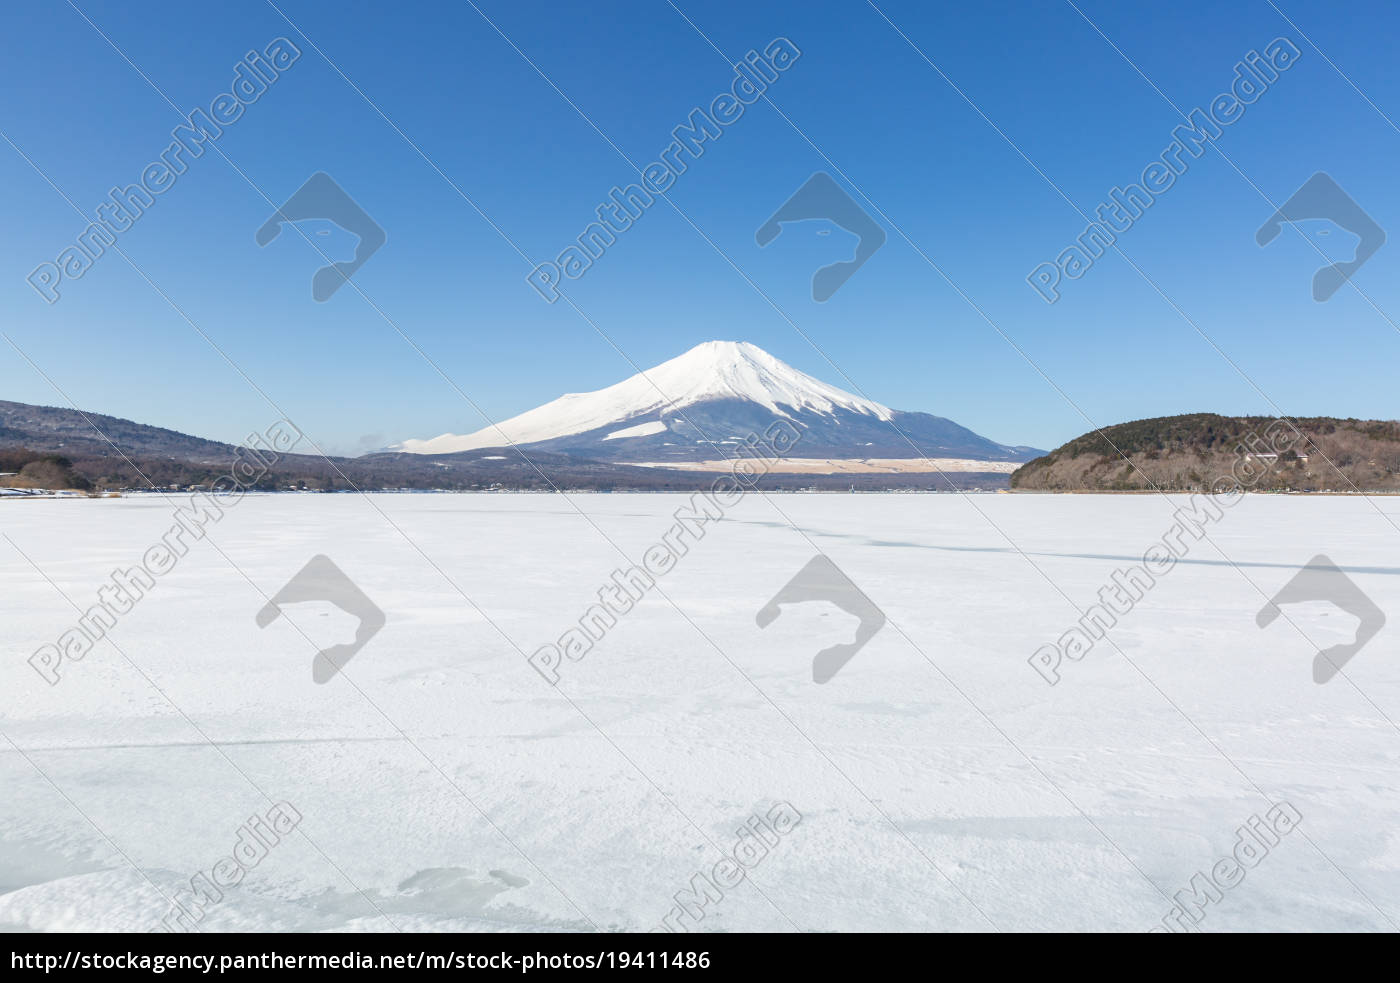 mountain, fuji, winter - 19411486